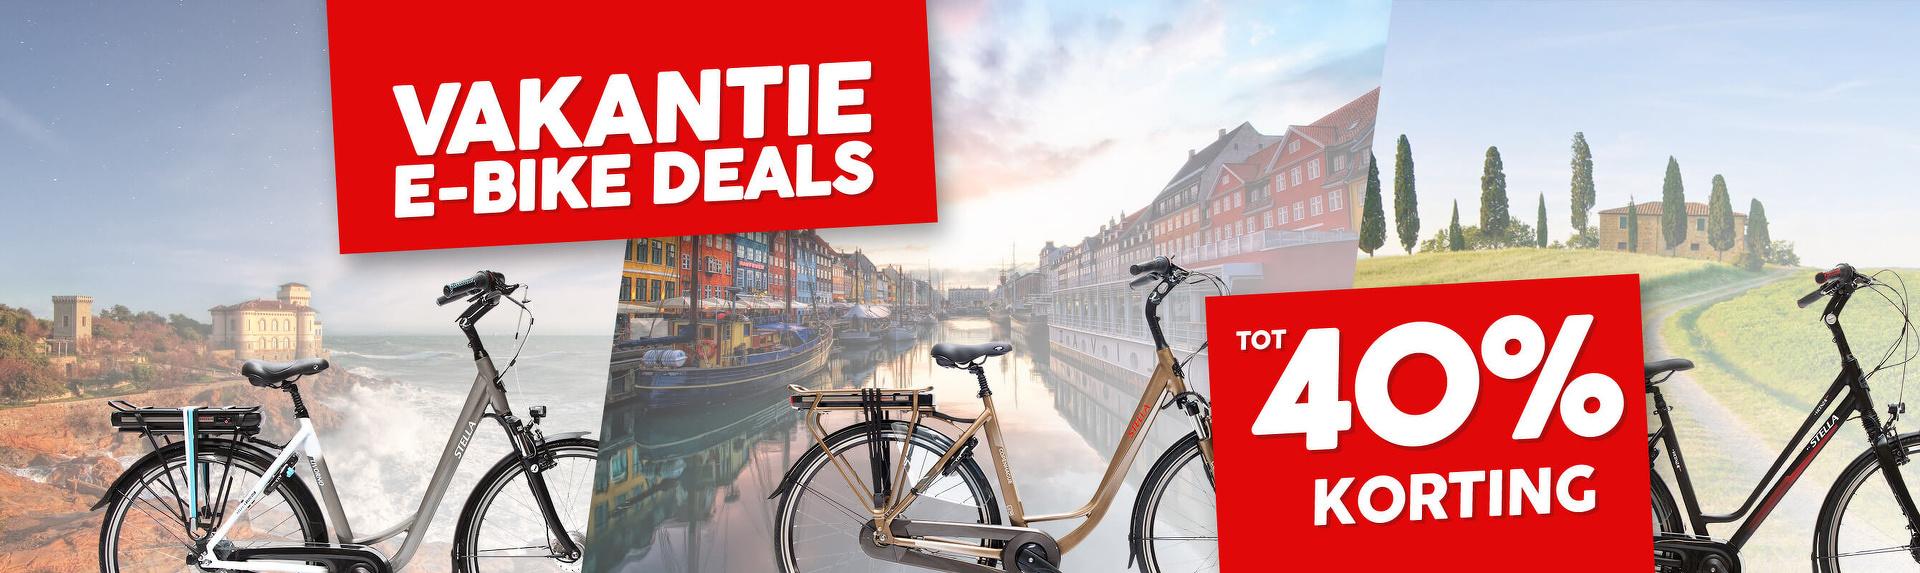 Vakantie E-bike Deals